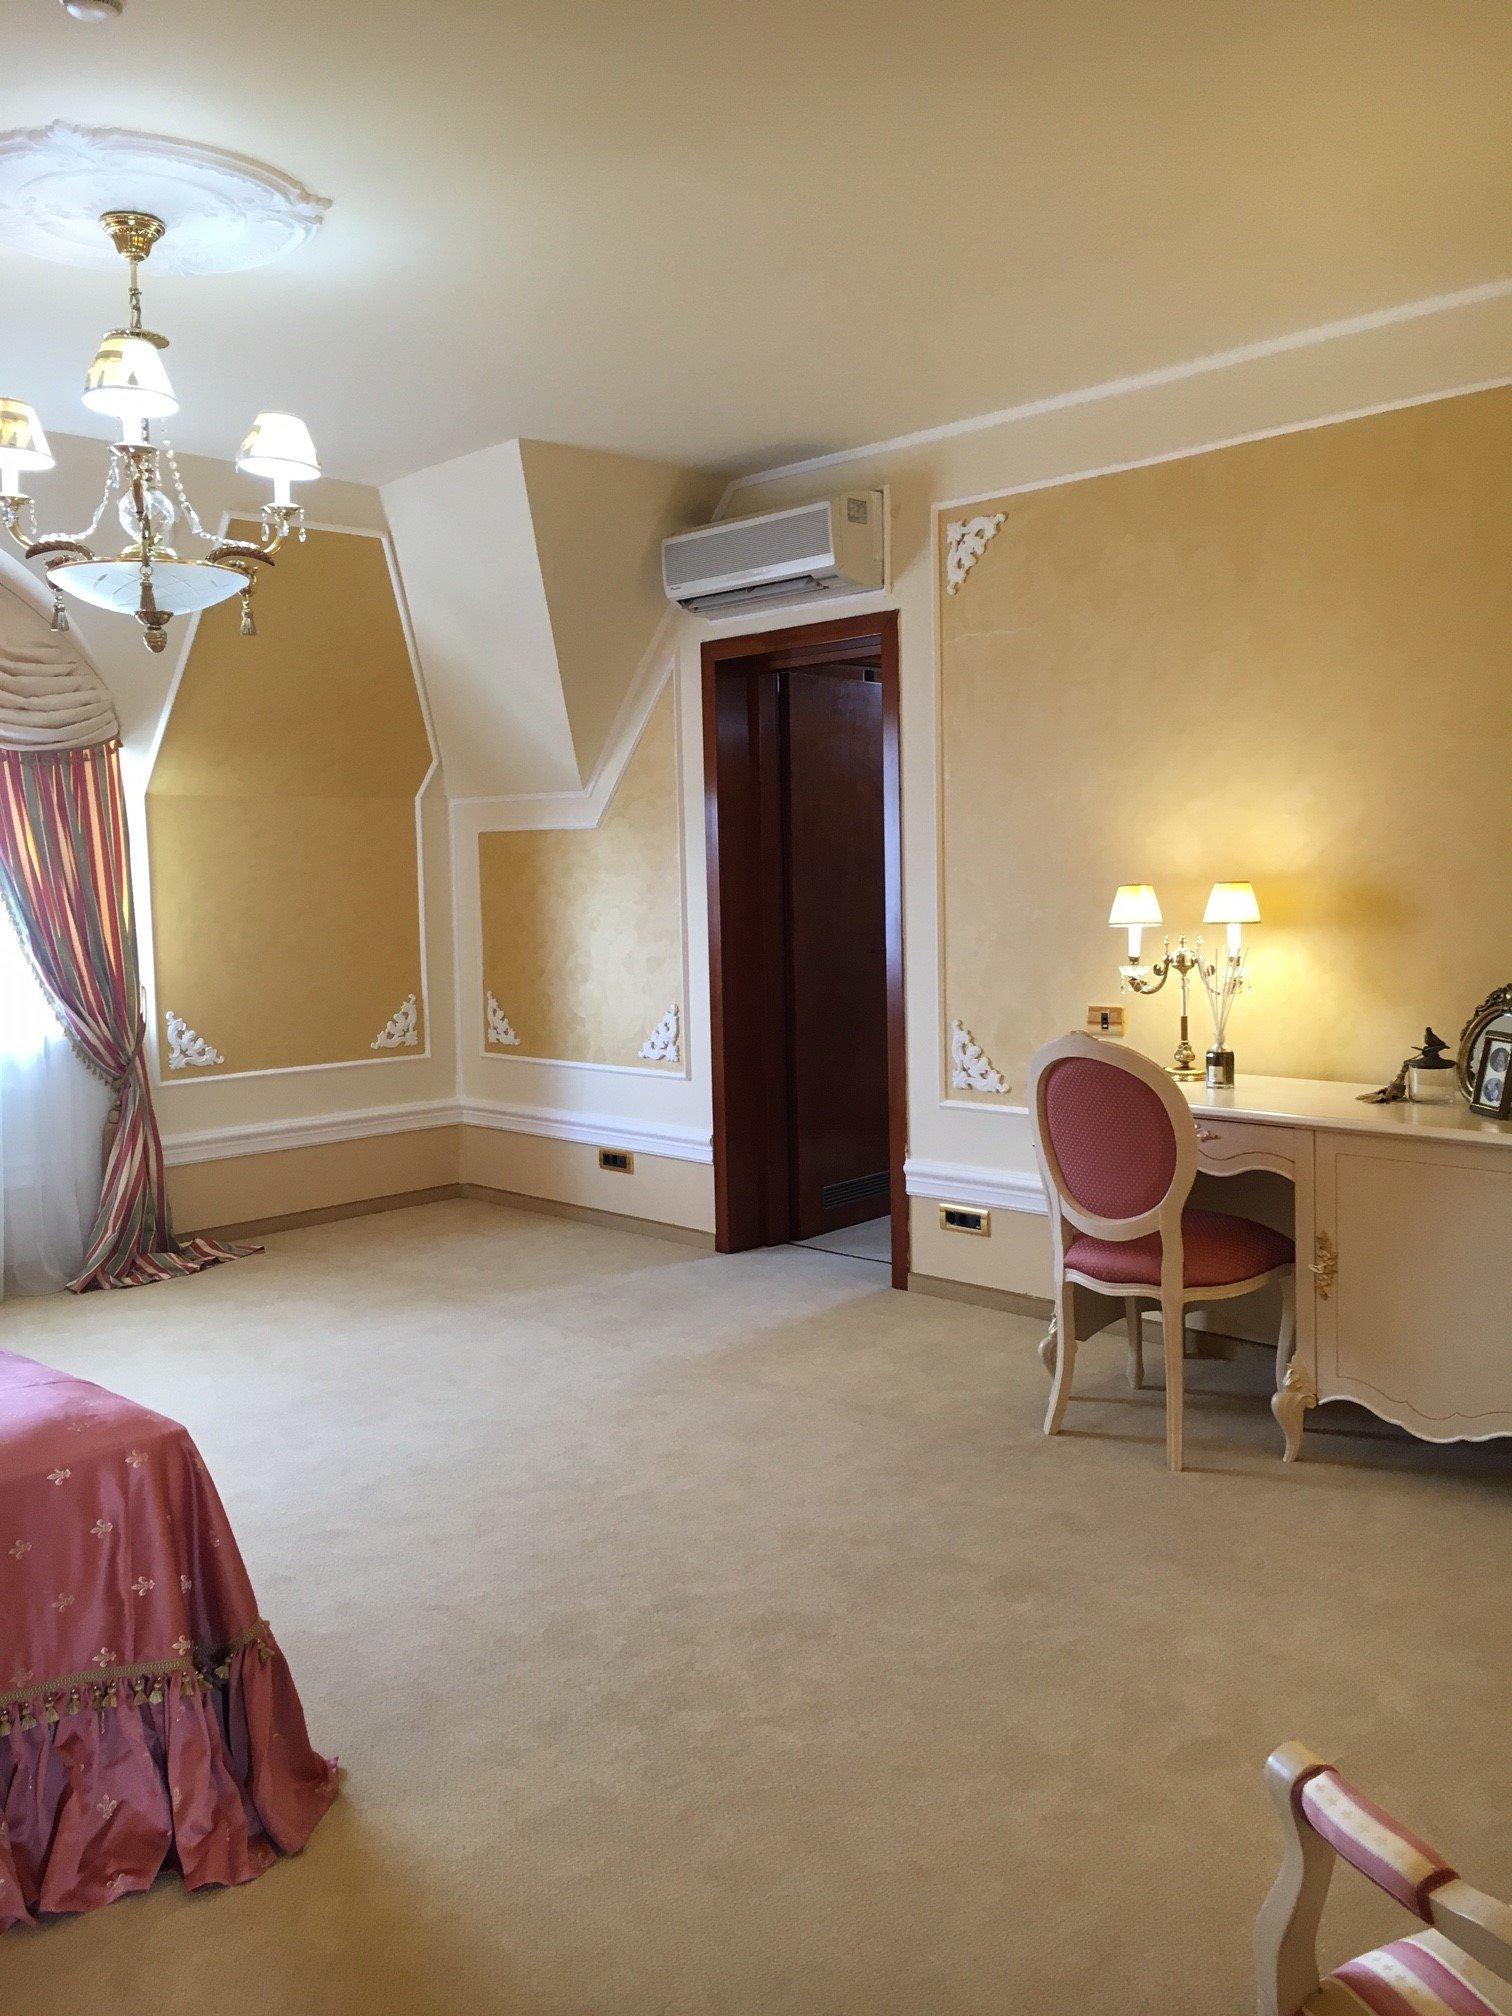 HOTEL ROOM BOUTIQUE 5 STAR BUCHAREST CLASSIC INTERIOR DESIGN